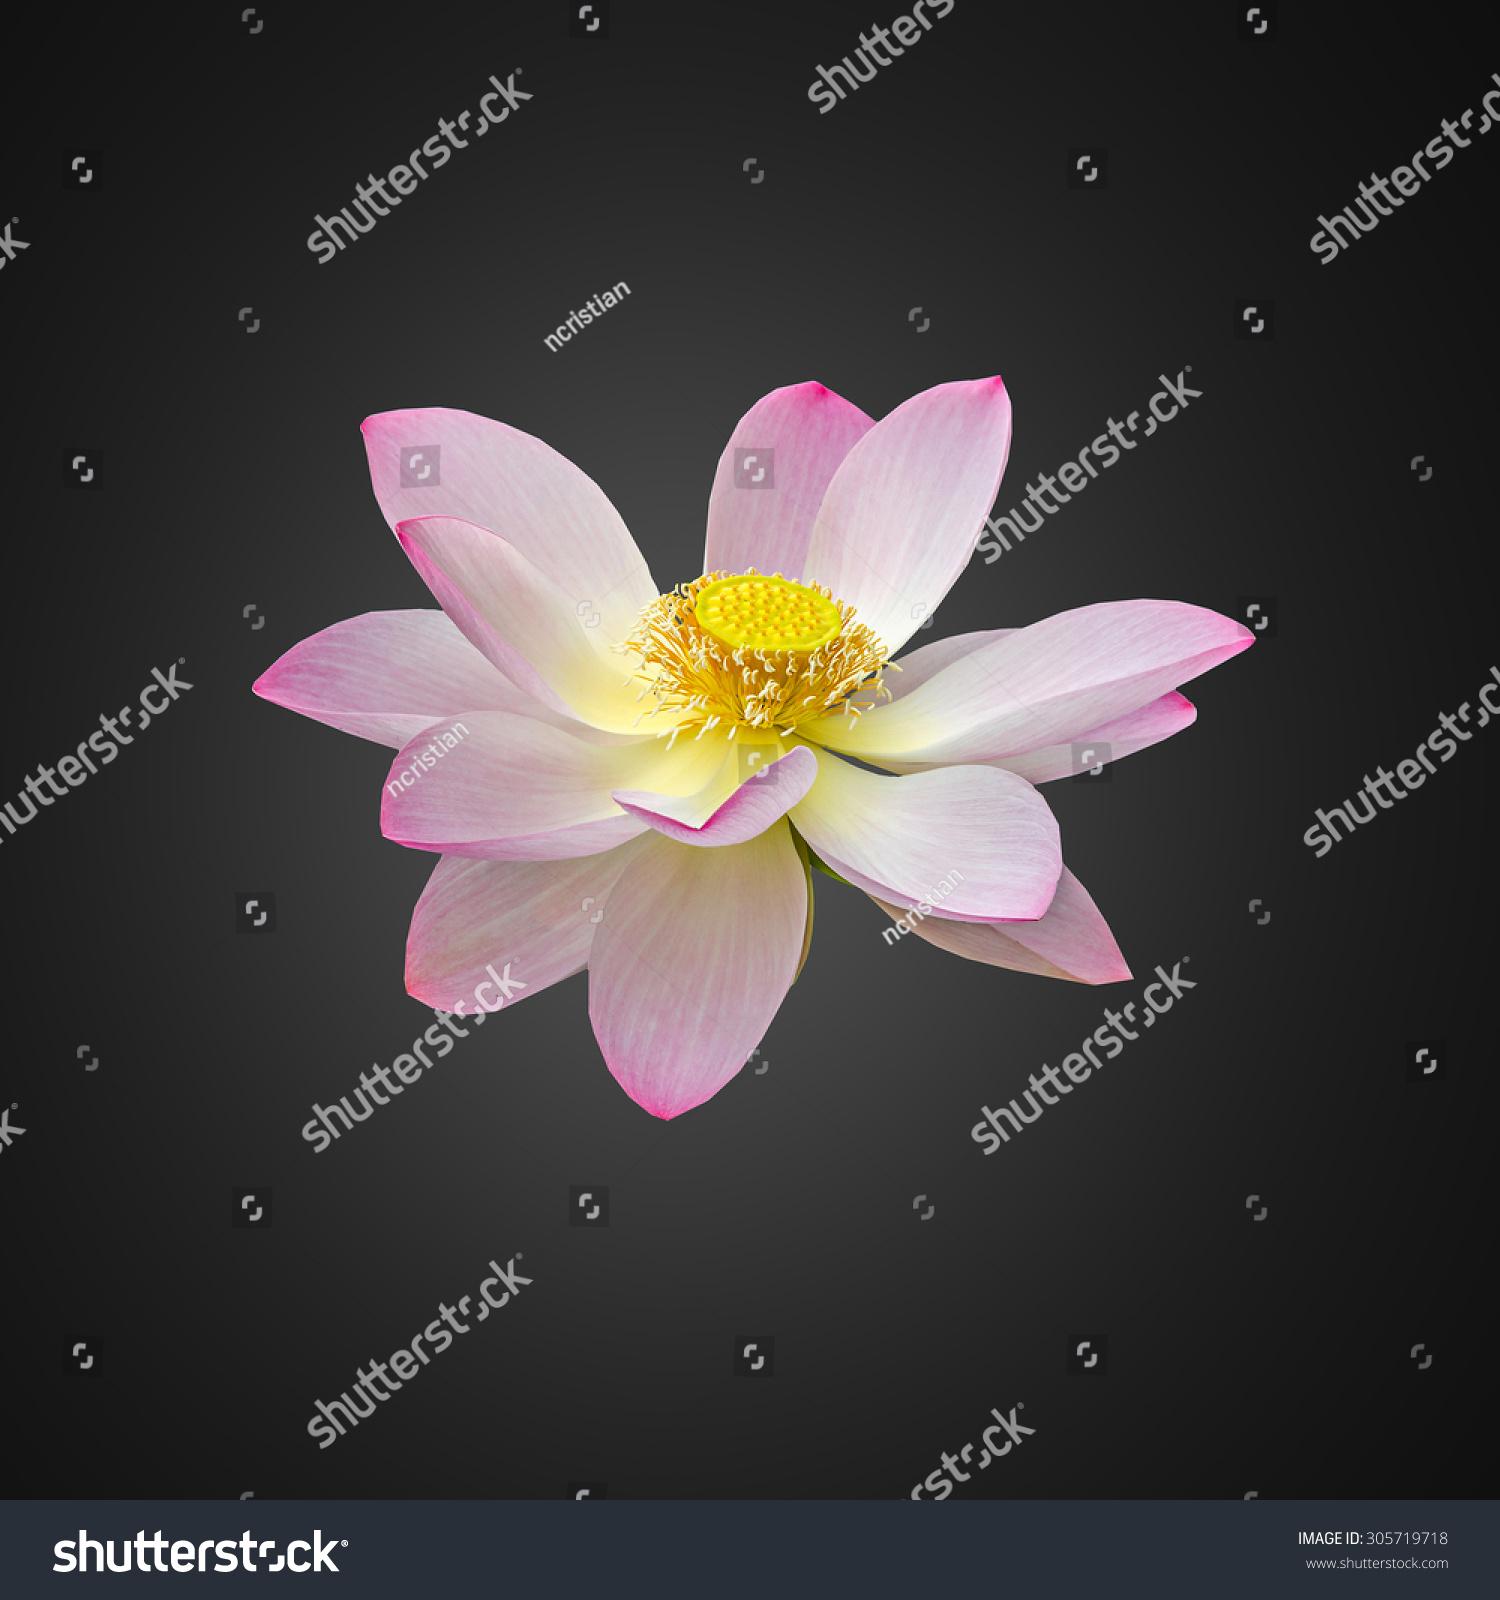 Pink white yellow nuphar flower water lily pond lily pink white yellow nuphar flower water lily pond lily spatterdock nelumbo nucifera also known as indian lotus sacred lotus bean of india lotus izmirmasajfo